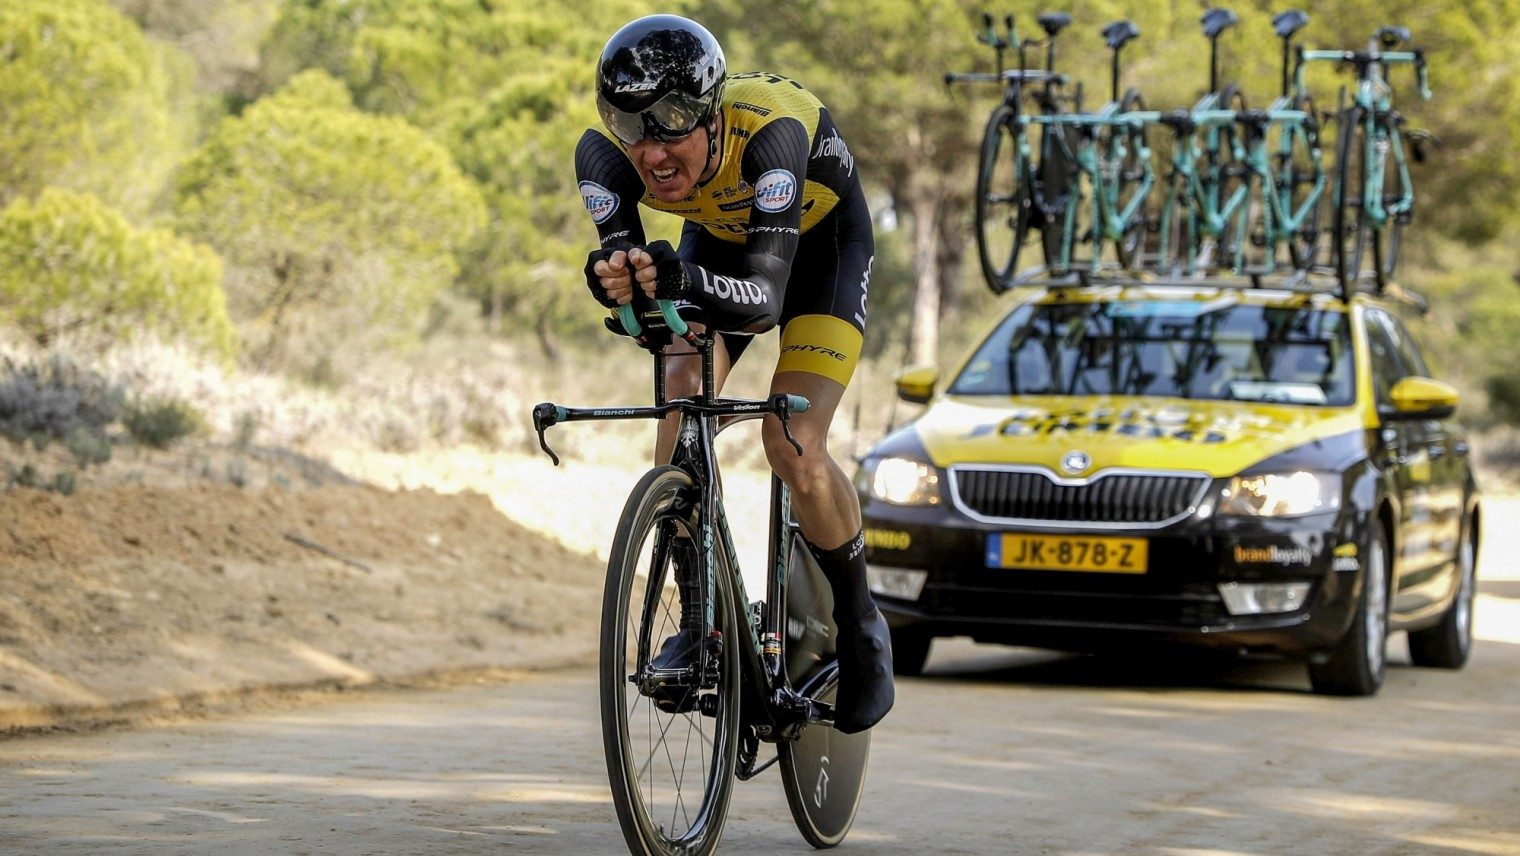 Тимо Роозен и Стивен Крёйсвейк продлили контракты с Team LottoNL-Jumbo